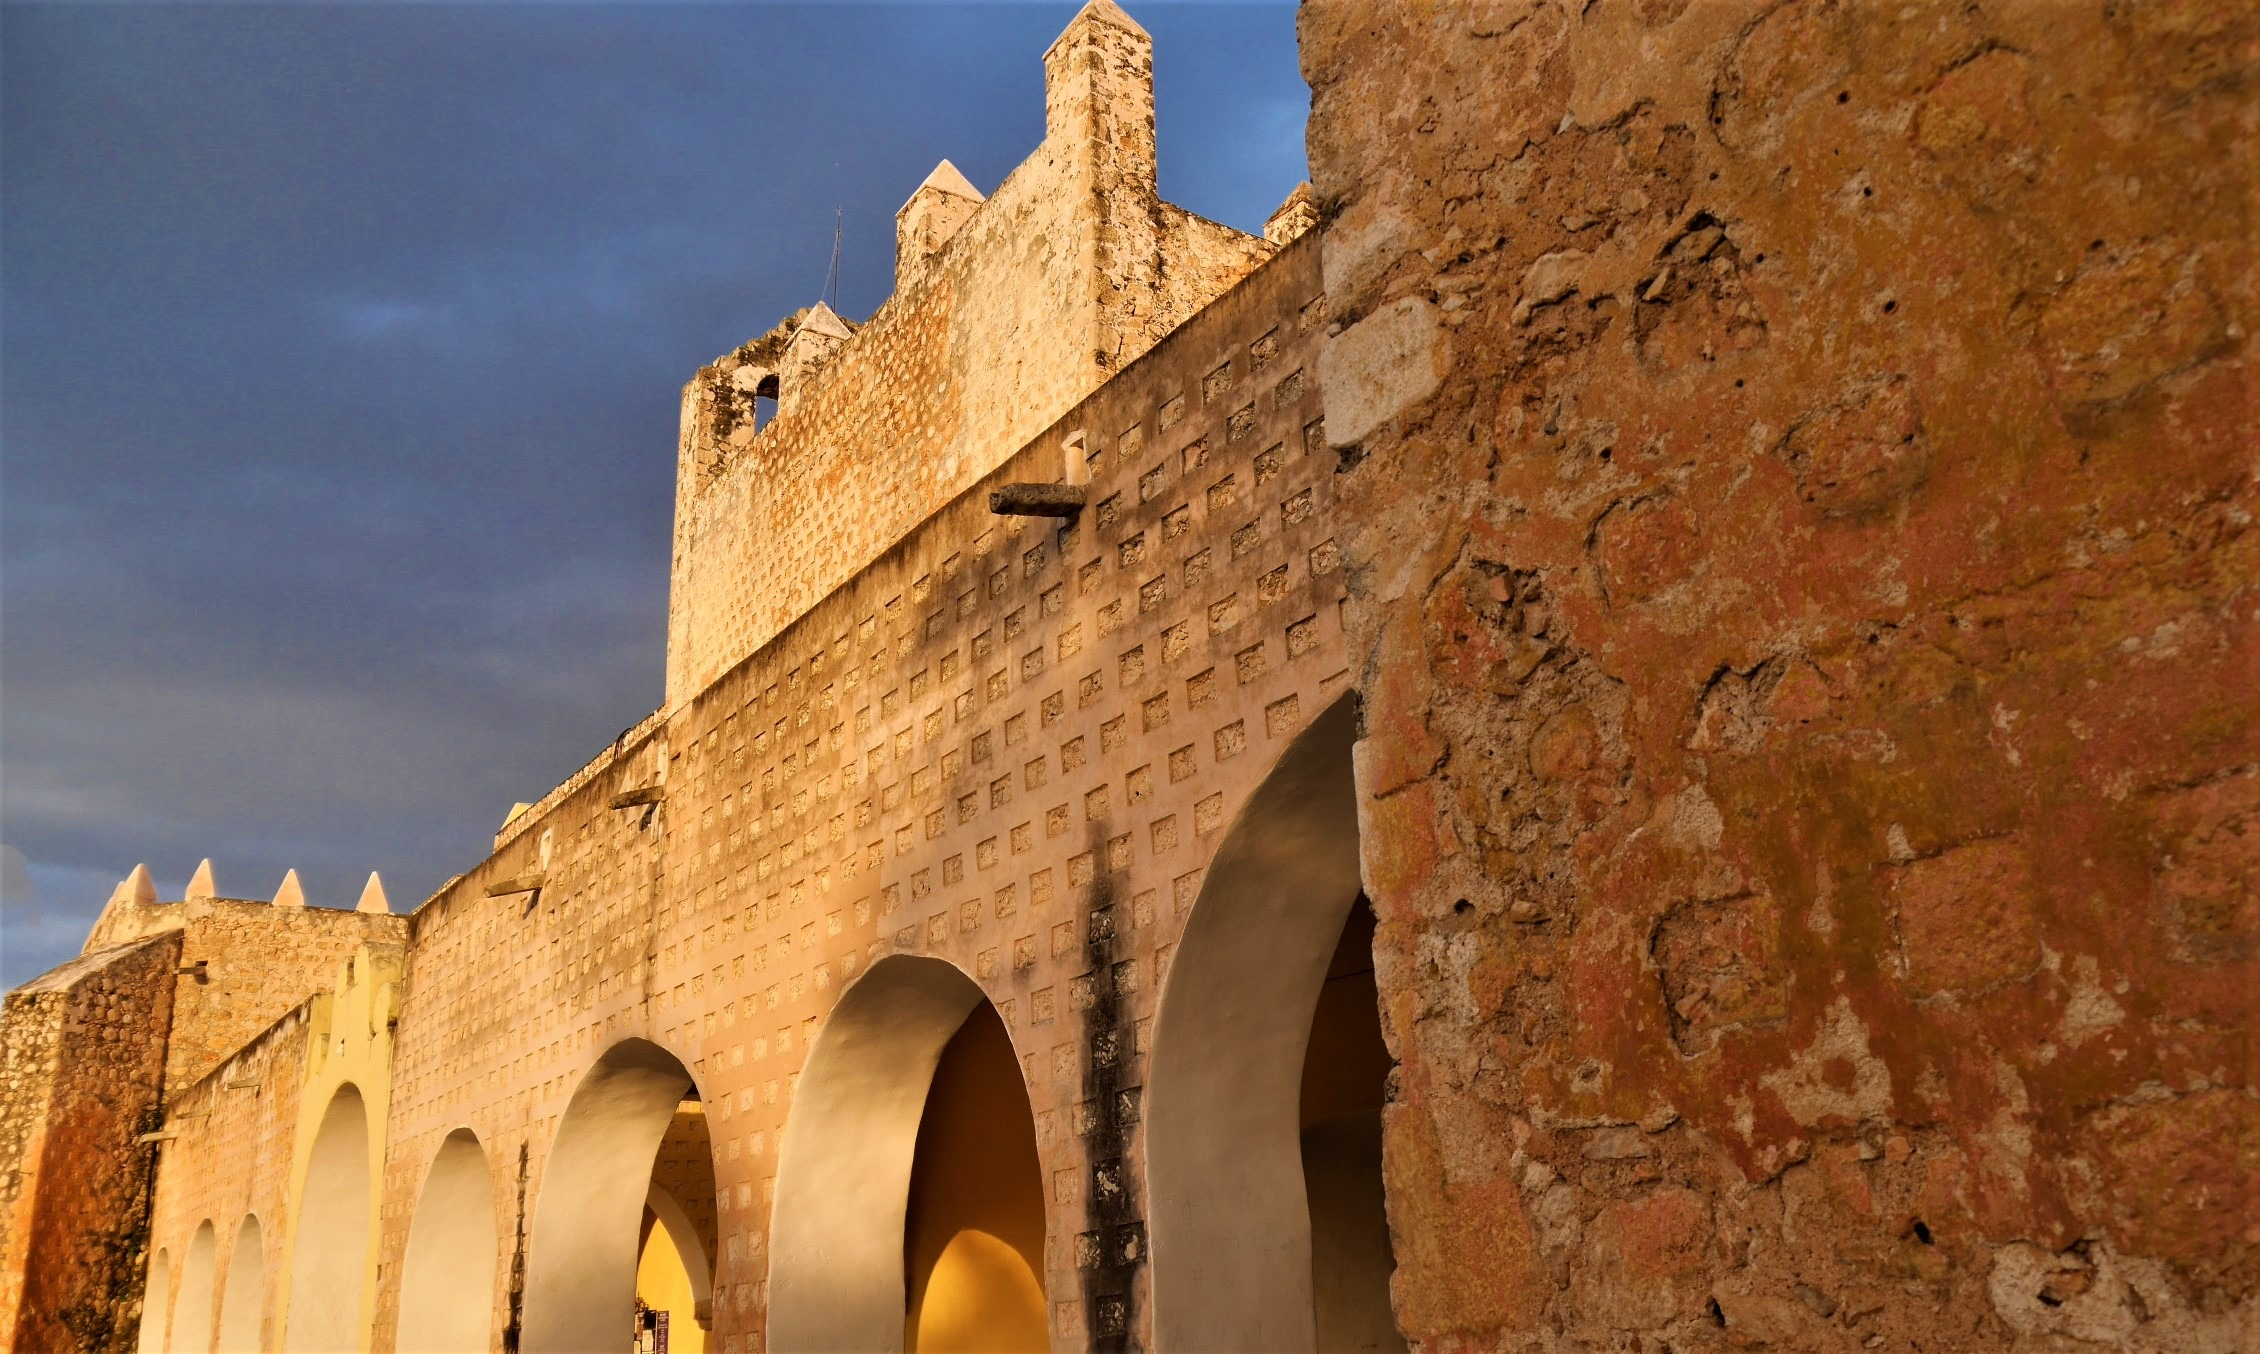 Valladolid visiter couvent san bernardino blog voyage yucatan arpenter le chemin